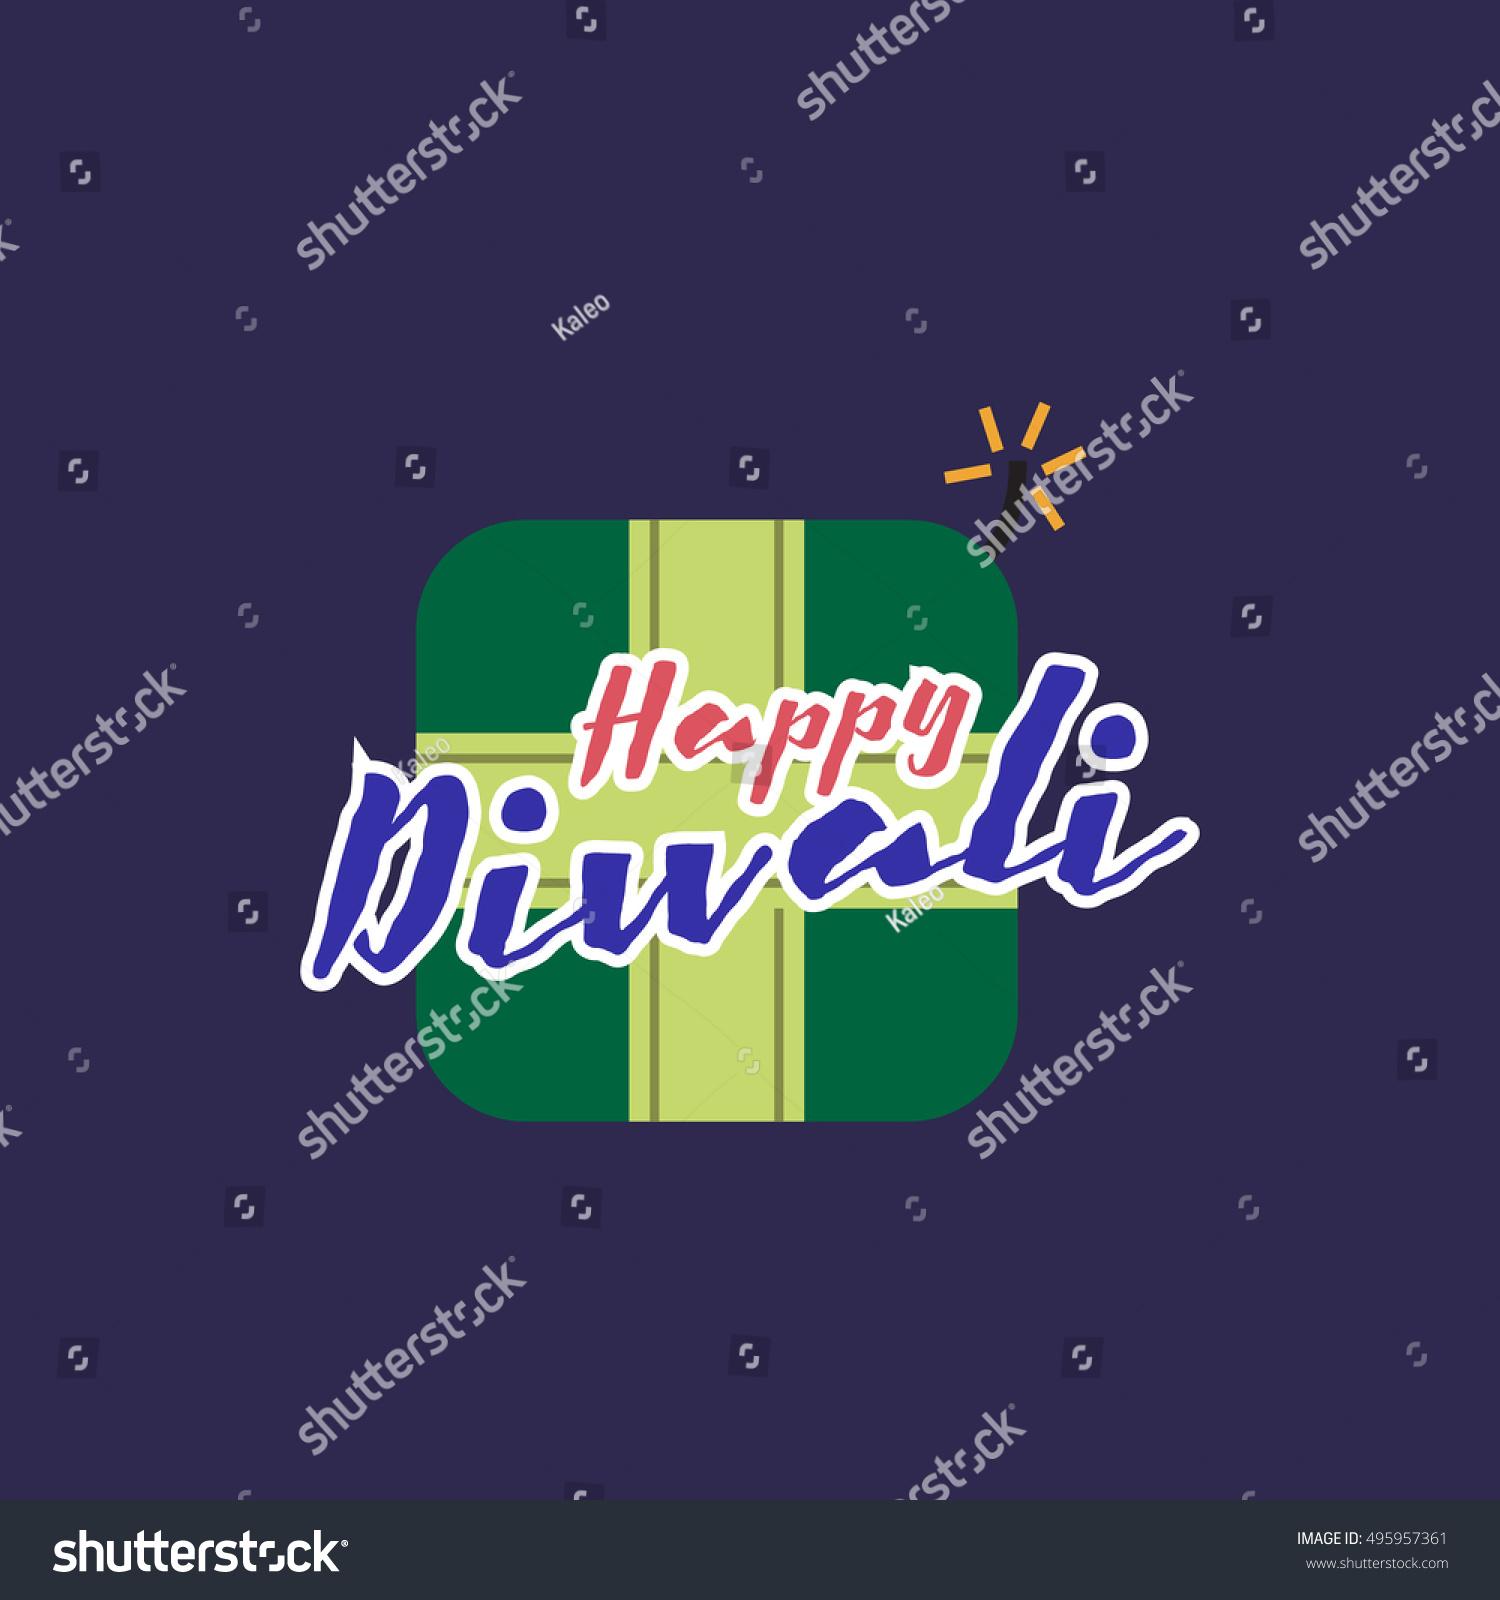 Crackers Diwali Greetings Happy Diwali Concept Stock Vector Royalty